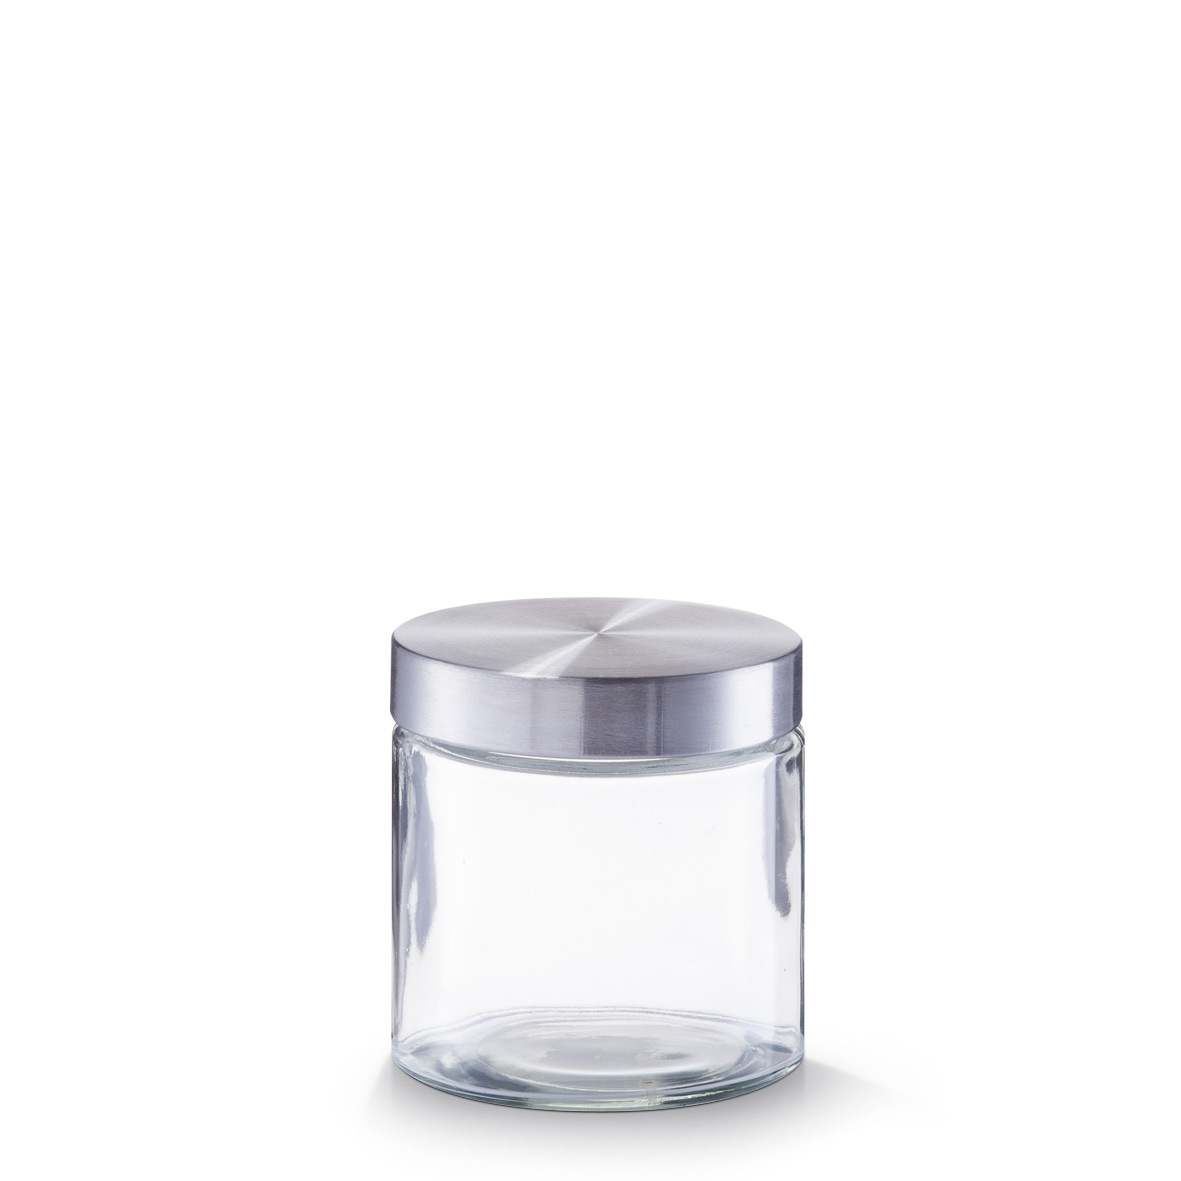 Borcan pentru depozitare, capac inox, Glass 750 ml, Ø 11xH12 cm imagine